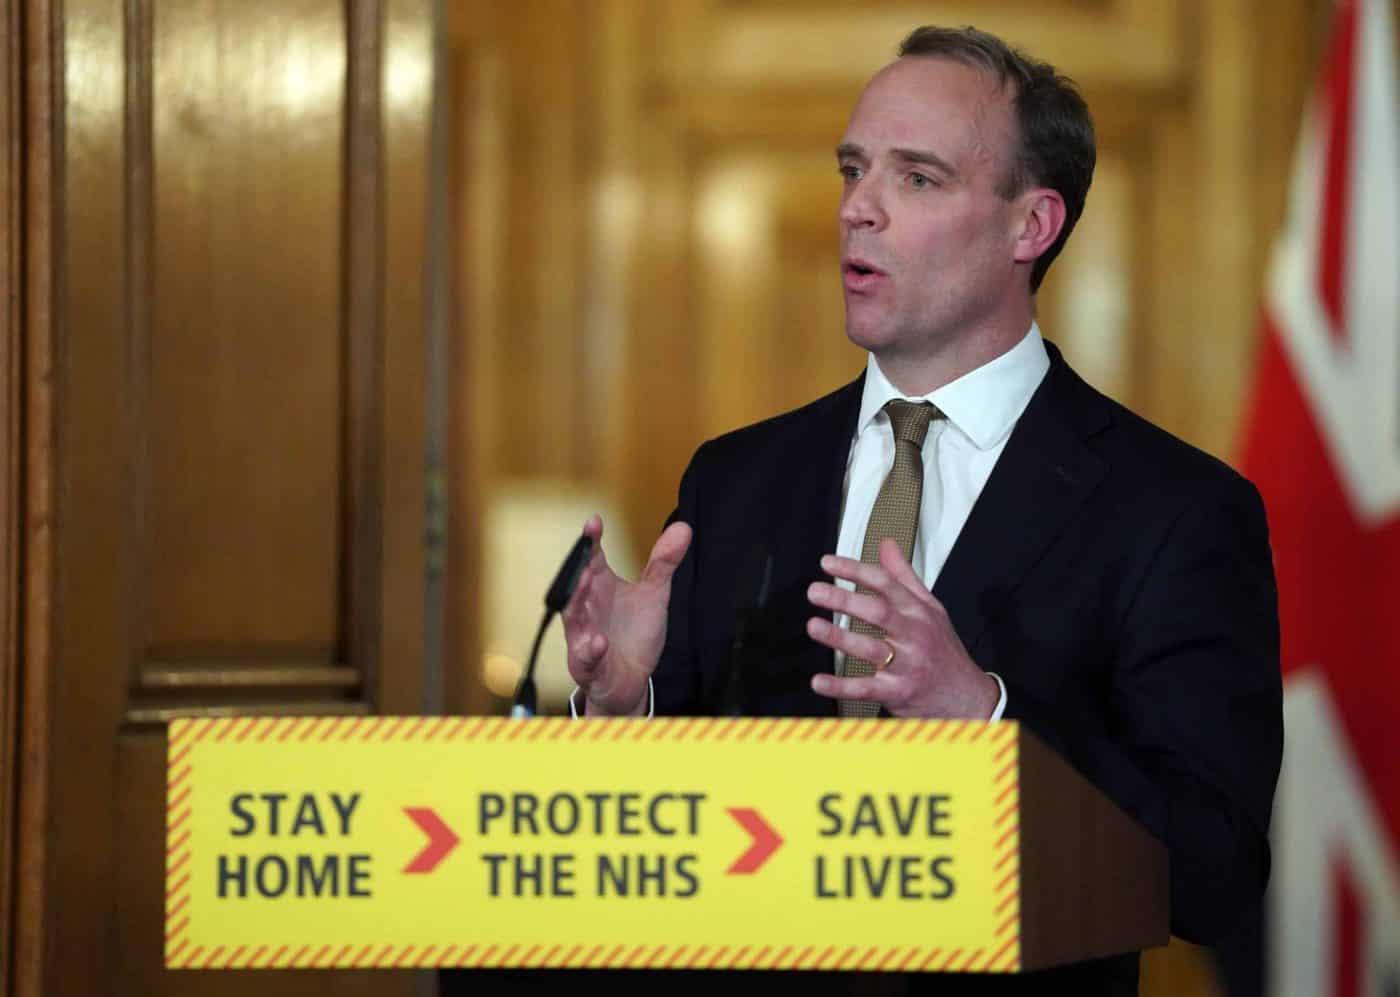 Coronavirus: Why are we still in lockdown in the UK?